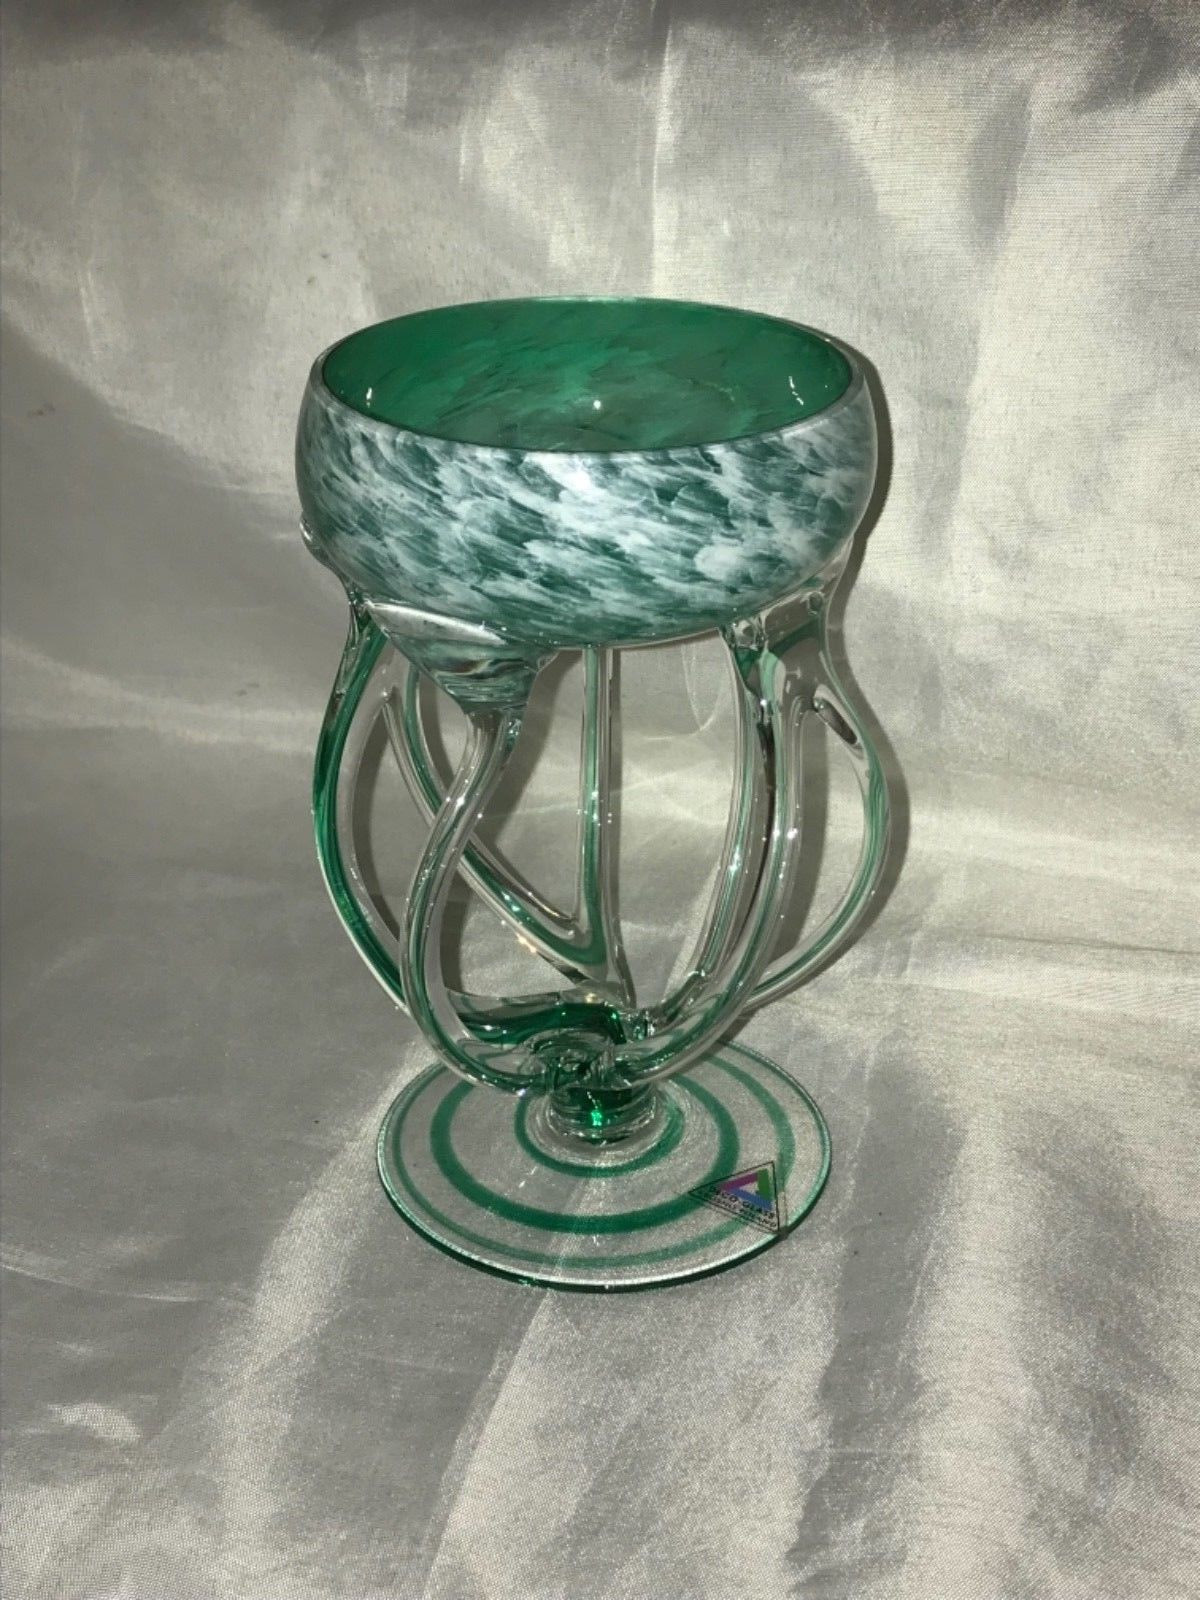 art nouveau glass vase of green emerald art deco glass jozefina krosno poland hand blown regarding 8 of 8 see more